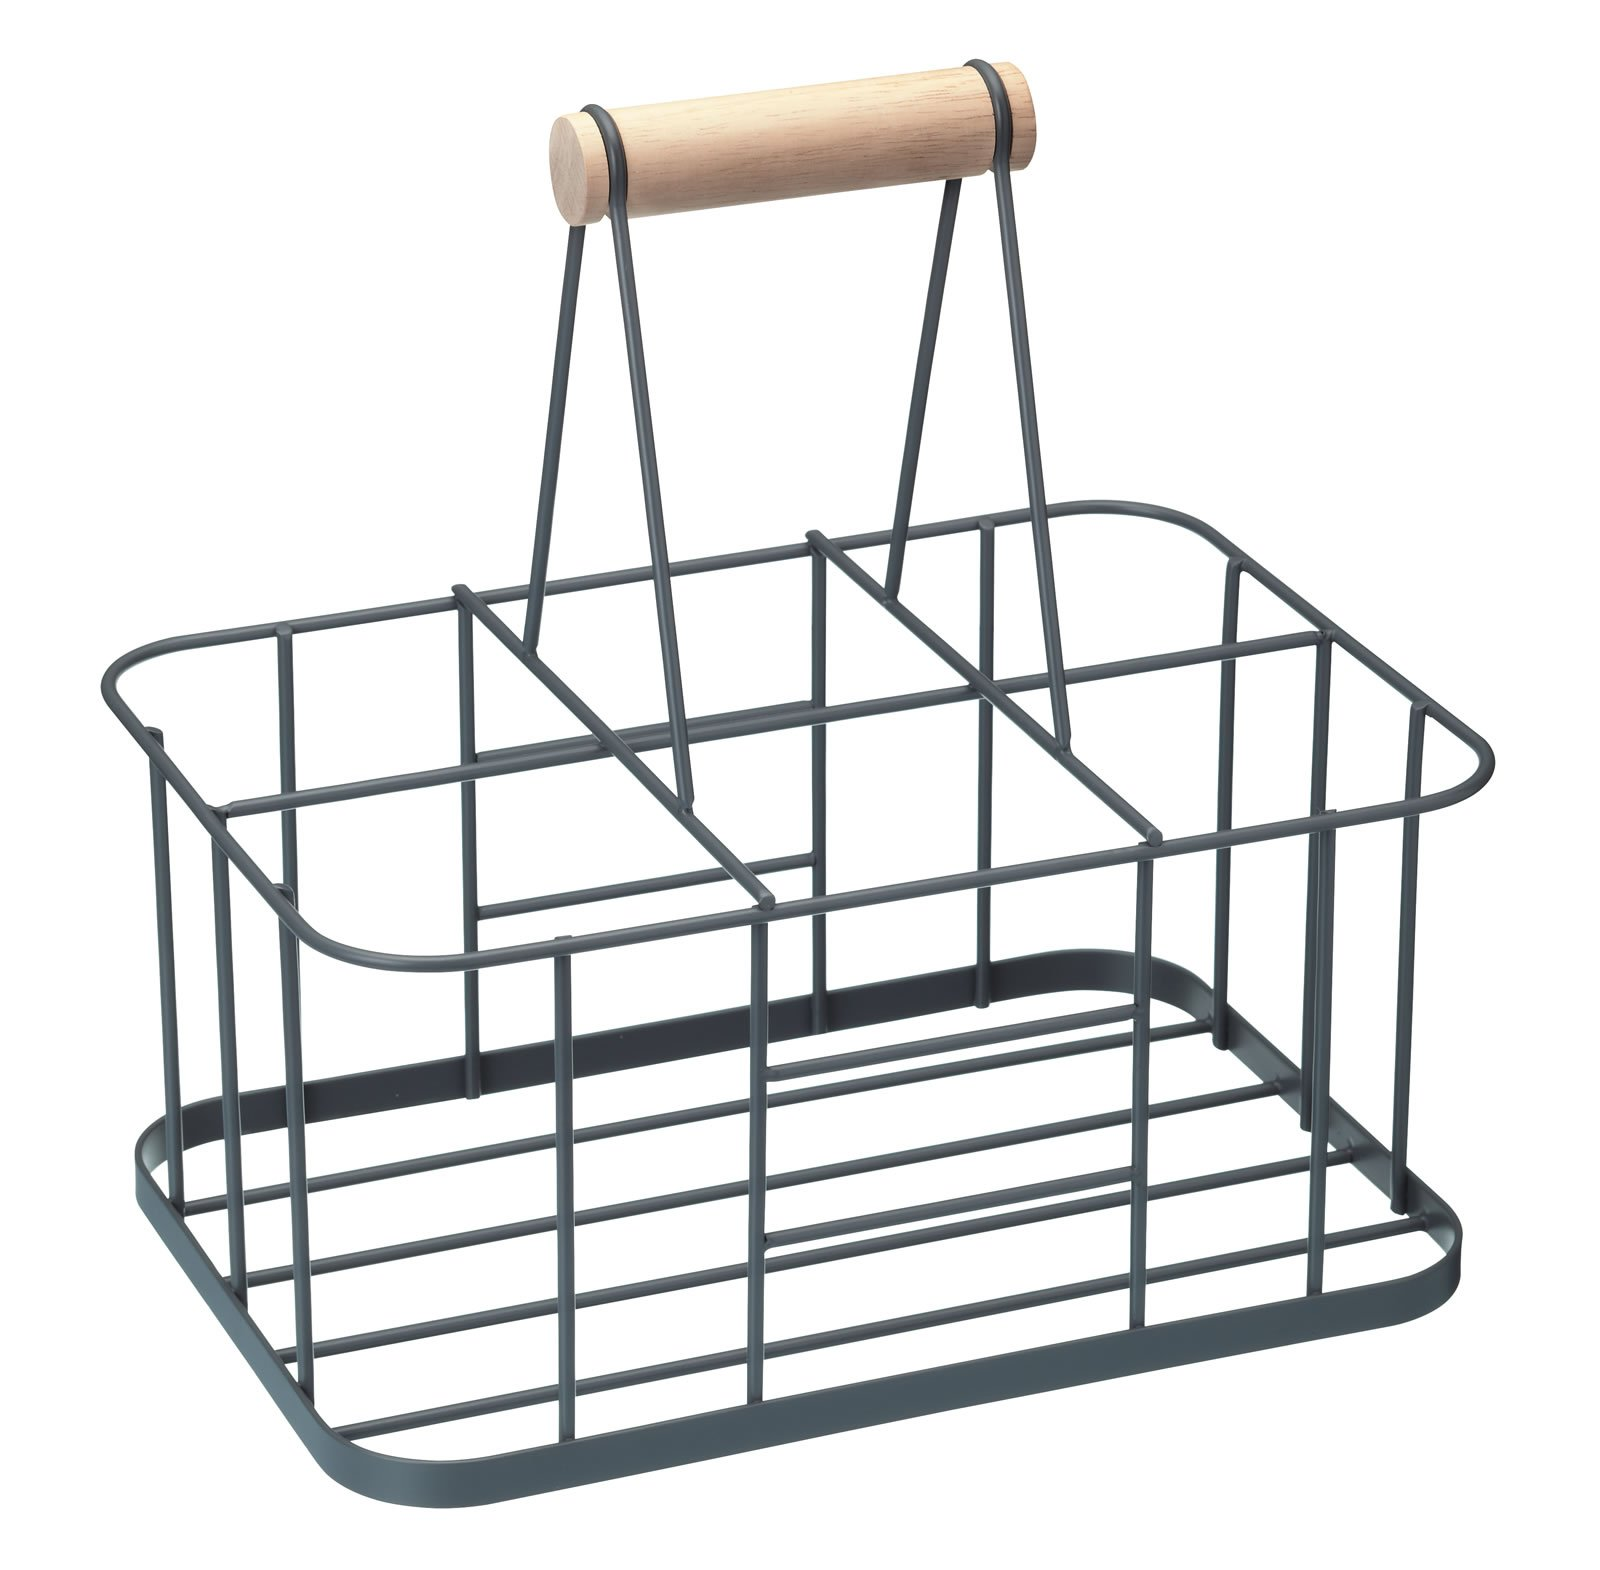 Kitchen Craft Living Nostalgia Metal Bottle Carrier Basket with Handle LNBCARRIER by KitchenCraft (Image #1)